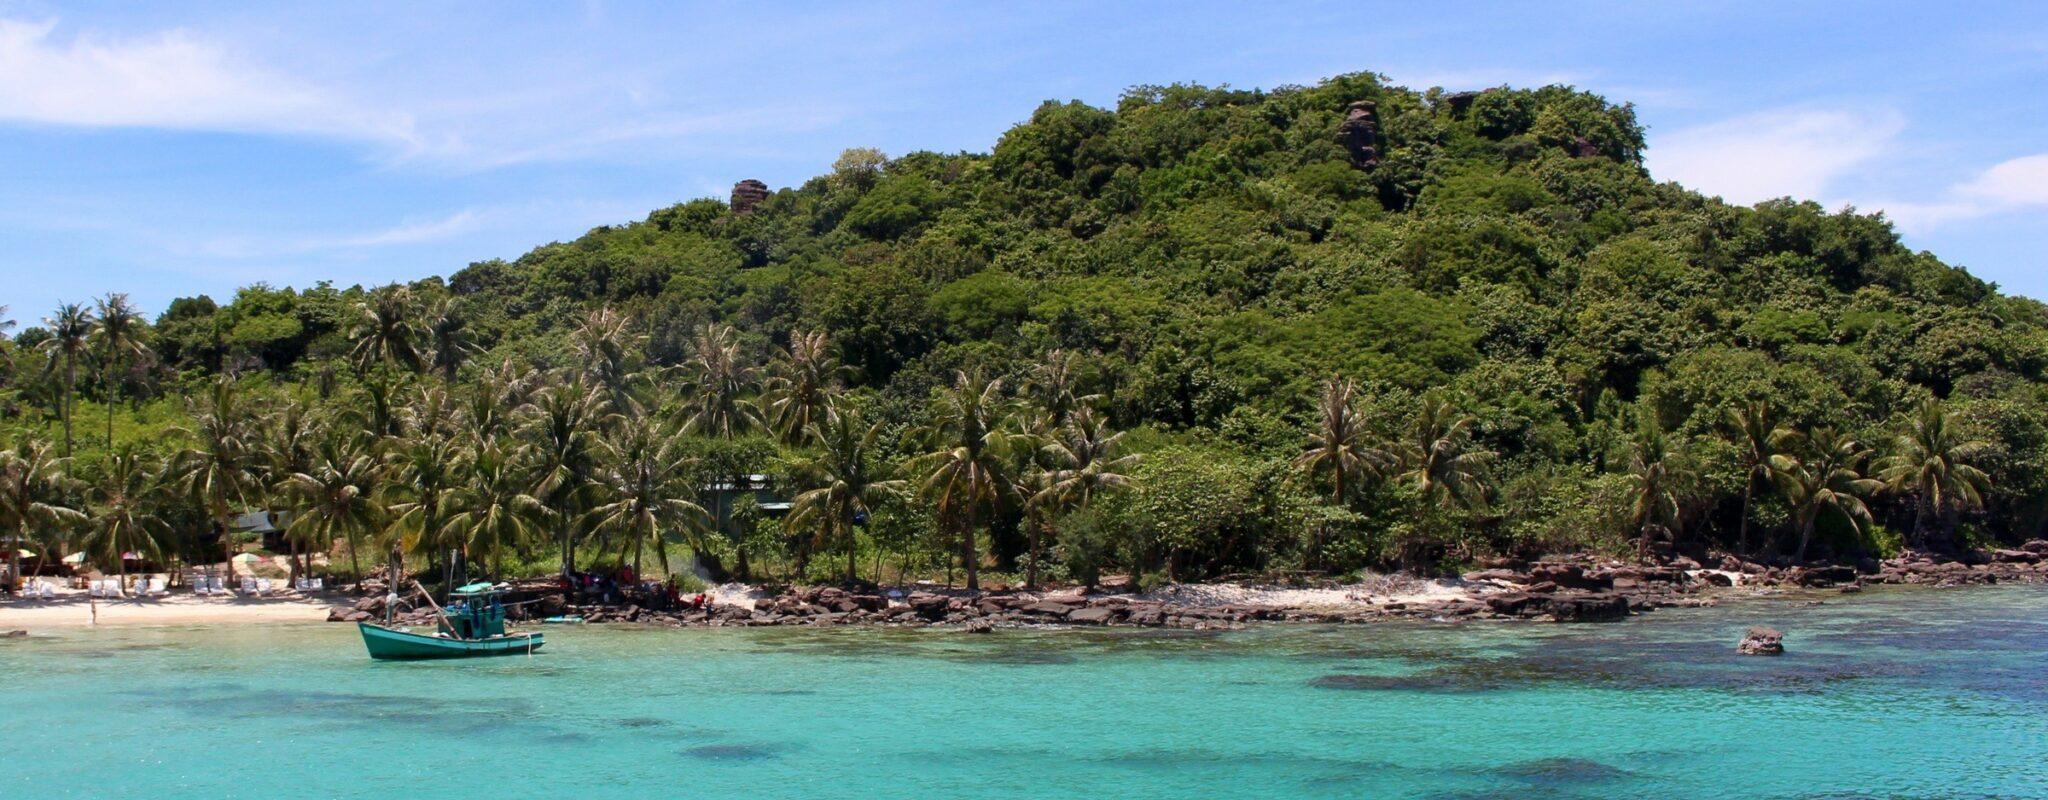 An Thoi Archipelago Phu Quoc Vietnam